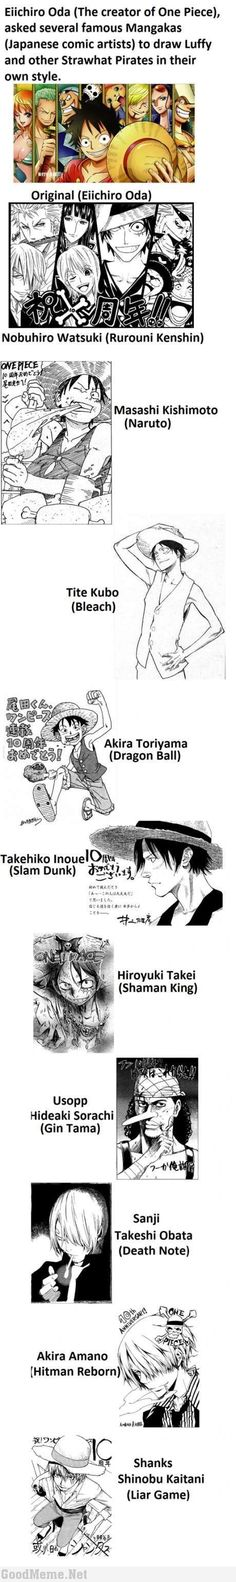 One Piece awesomeness - Good Meme